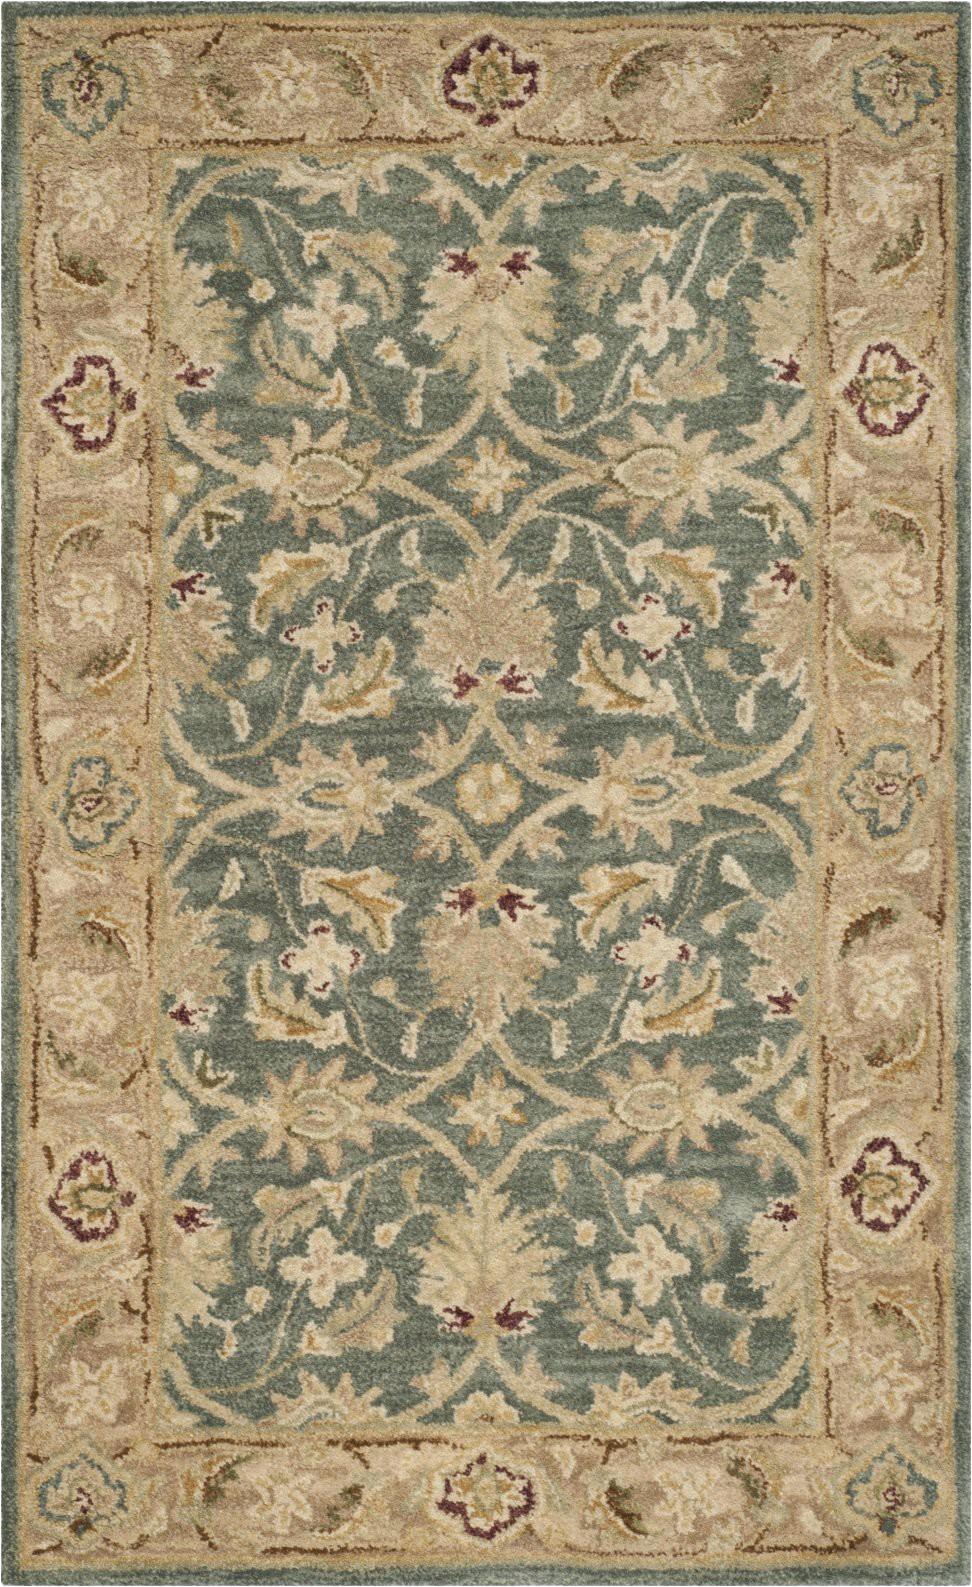 safavieh antiquity 822 grey blue beige area rug